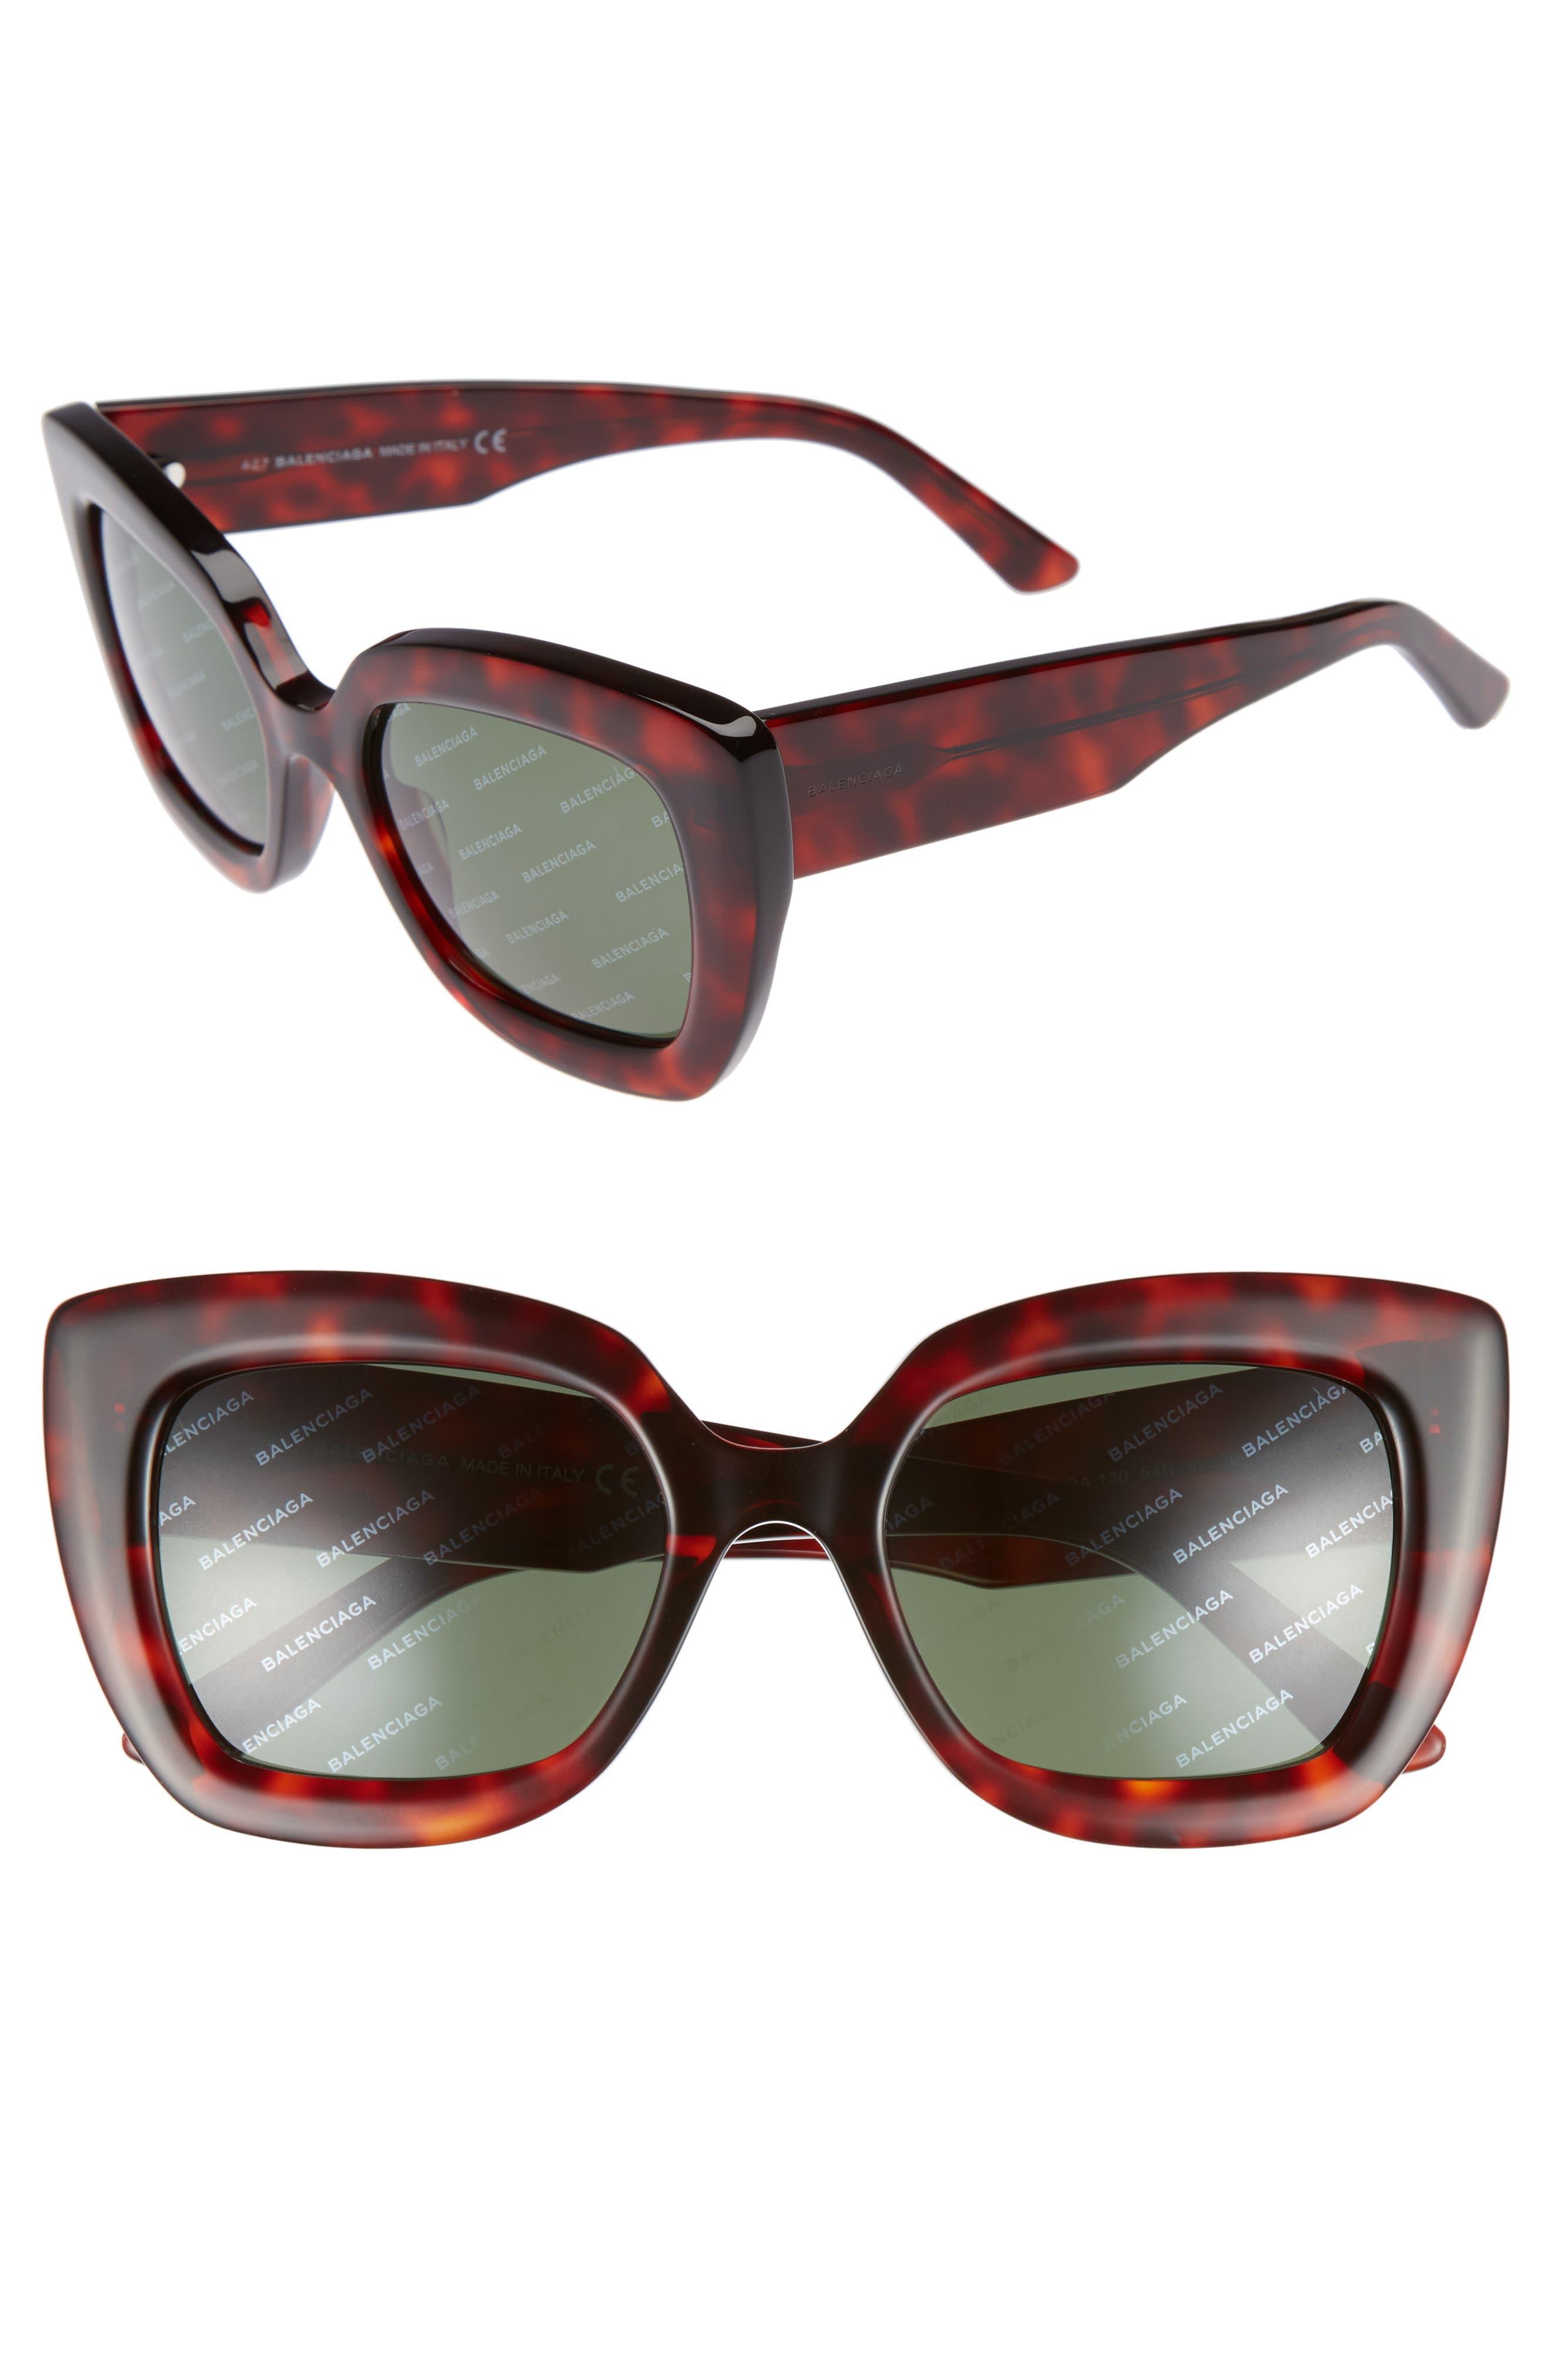 52mm Cat Eye Sunglasses,                             Main thumbnail 1, color,                             RED HAVANA/ GREEN